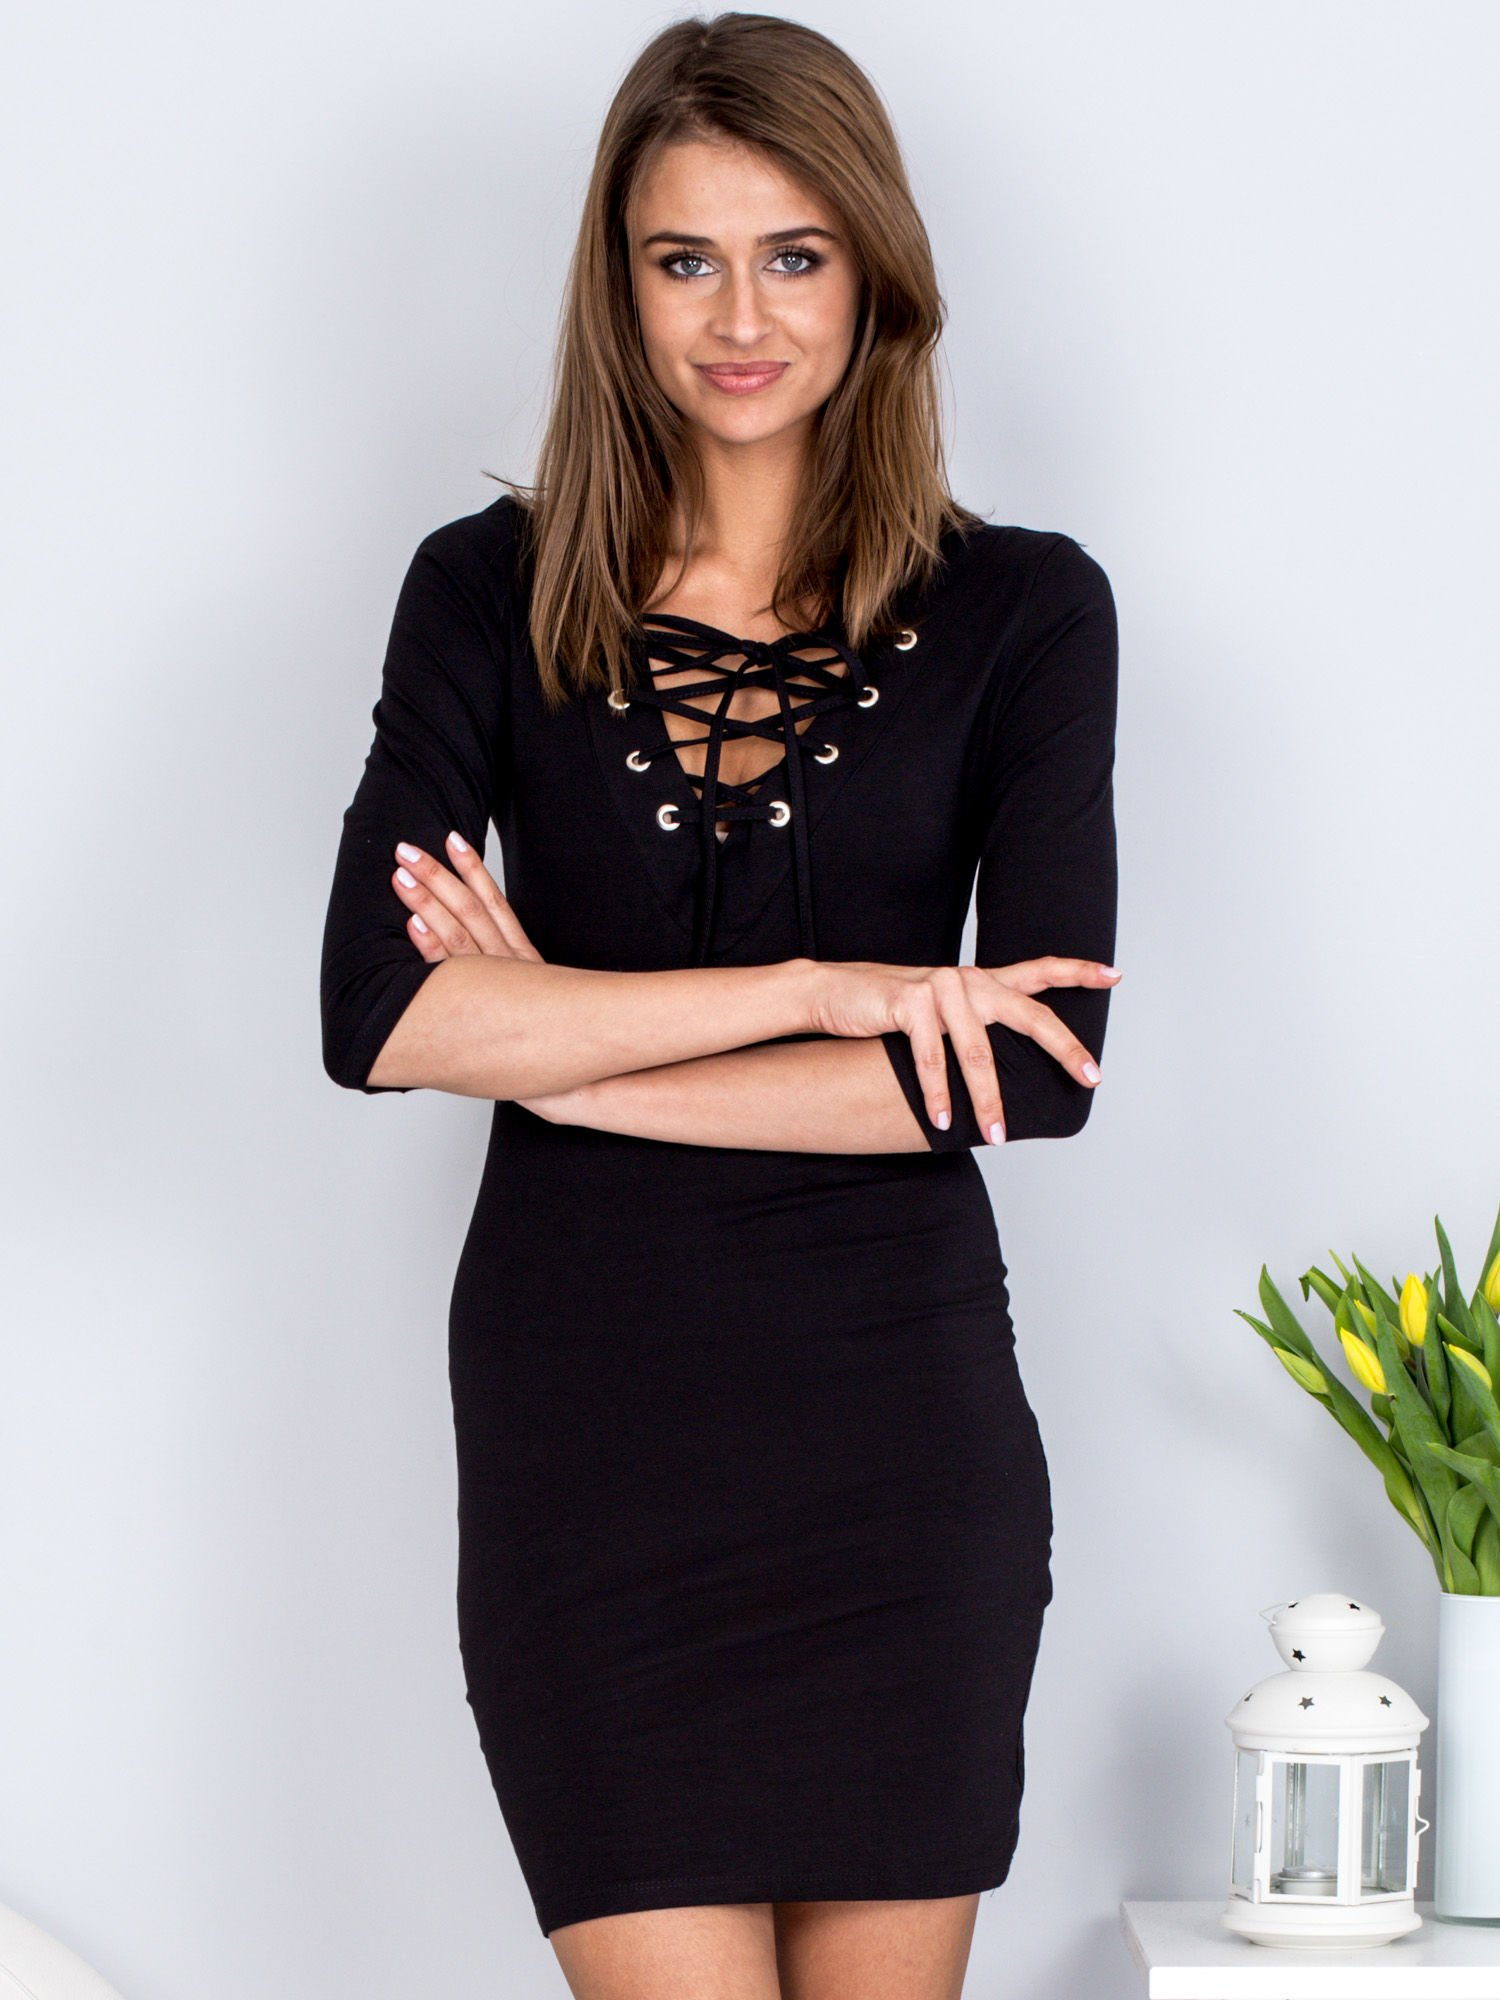 d4d2bd09e6 Czarna dopasowana sukienka ze sznurowanym dekoltem - Sukienka basic ...